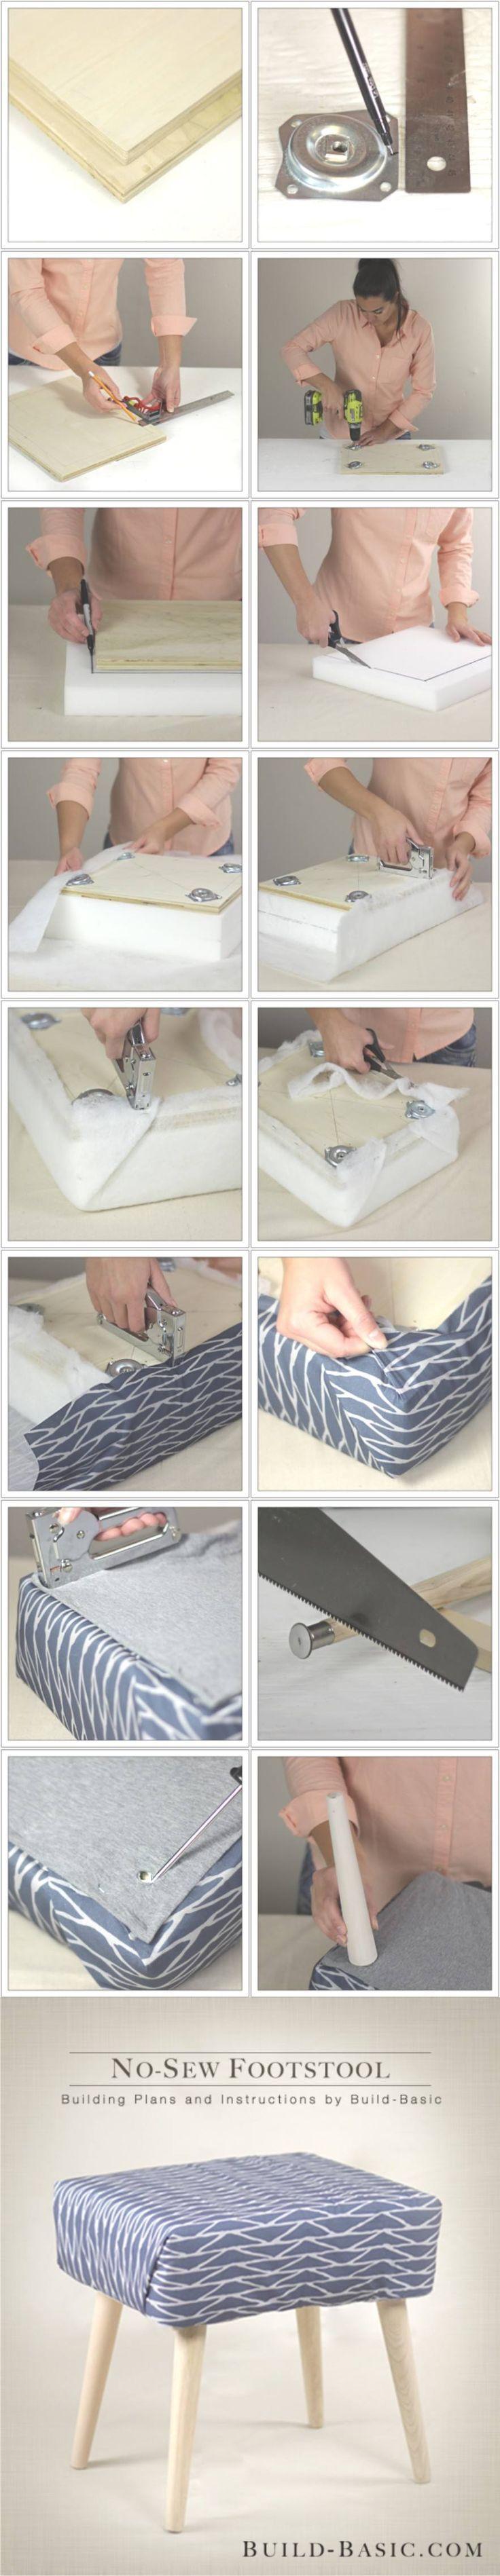 DIY No Sew Footstool - http://build-basic.com - Taburete DIY sin coser